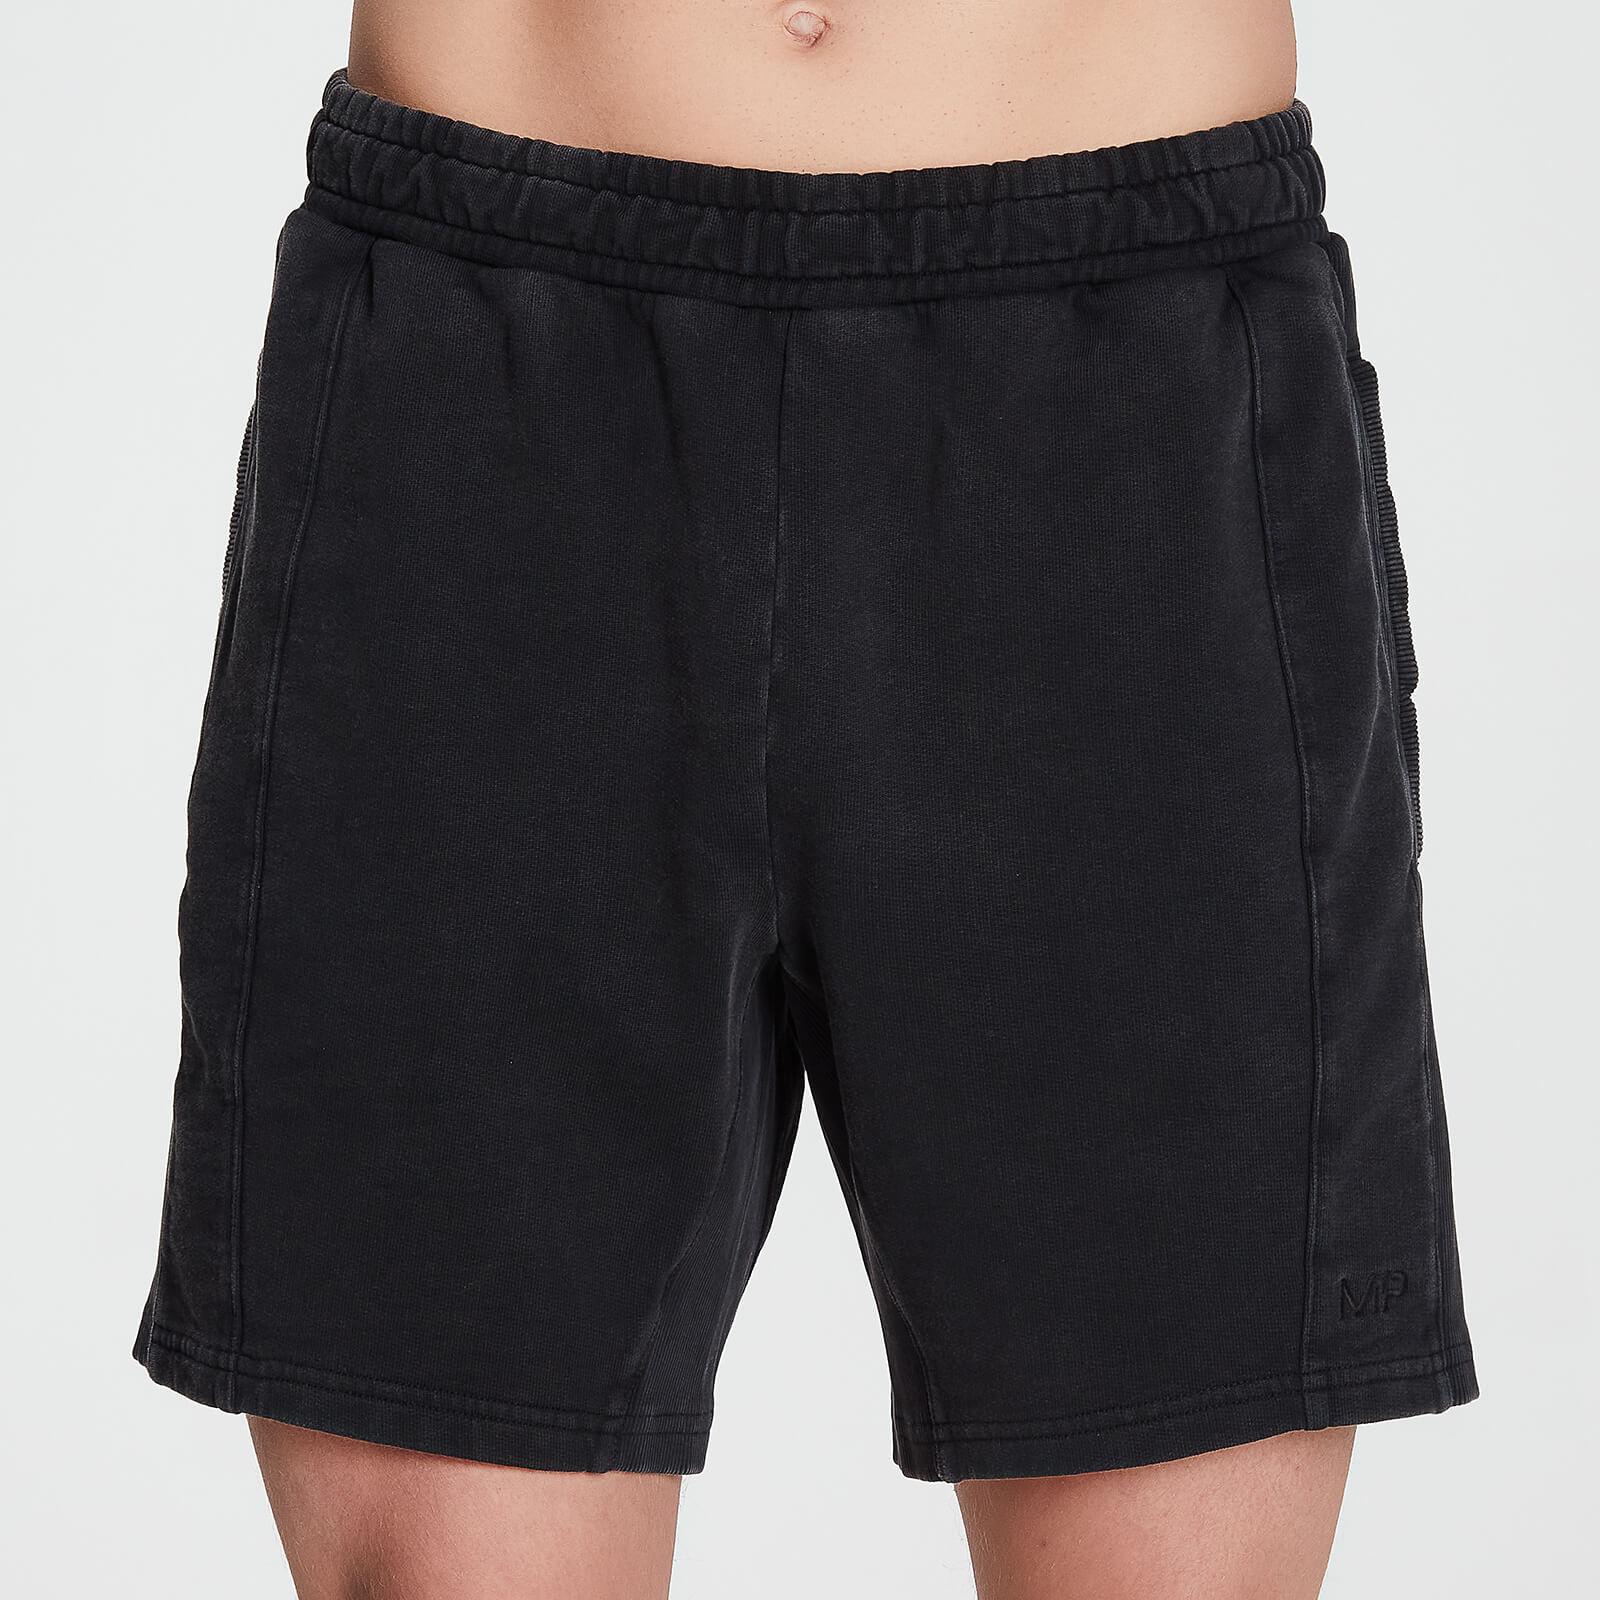 Купить MP Men's Raw Training Shorts - Black - XXS, Myprotein International